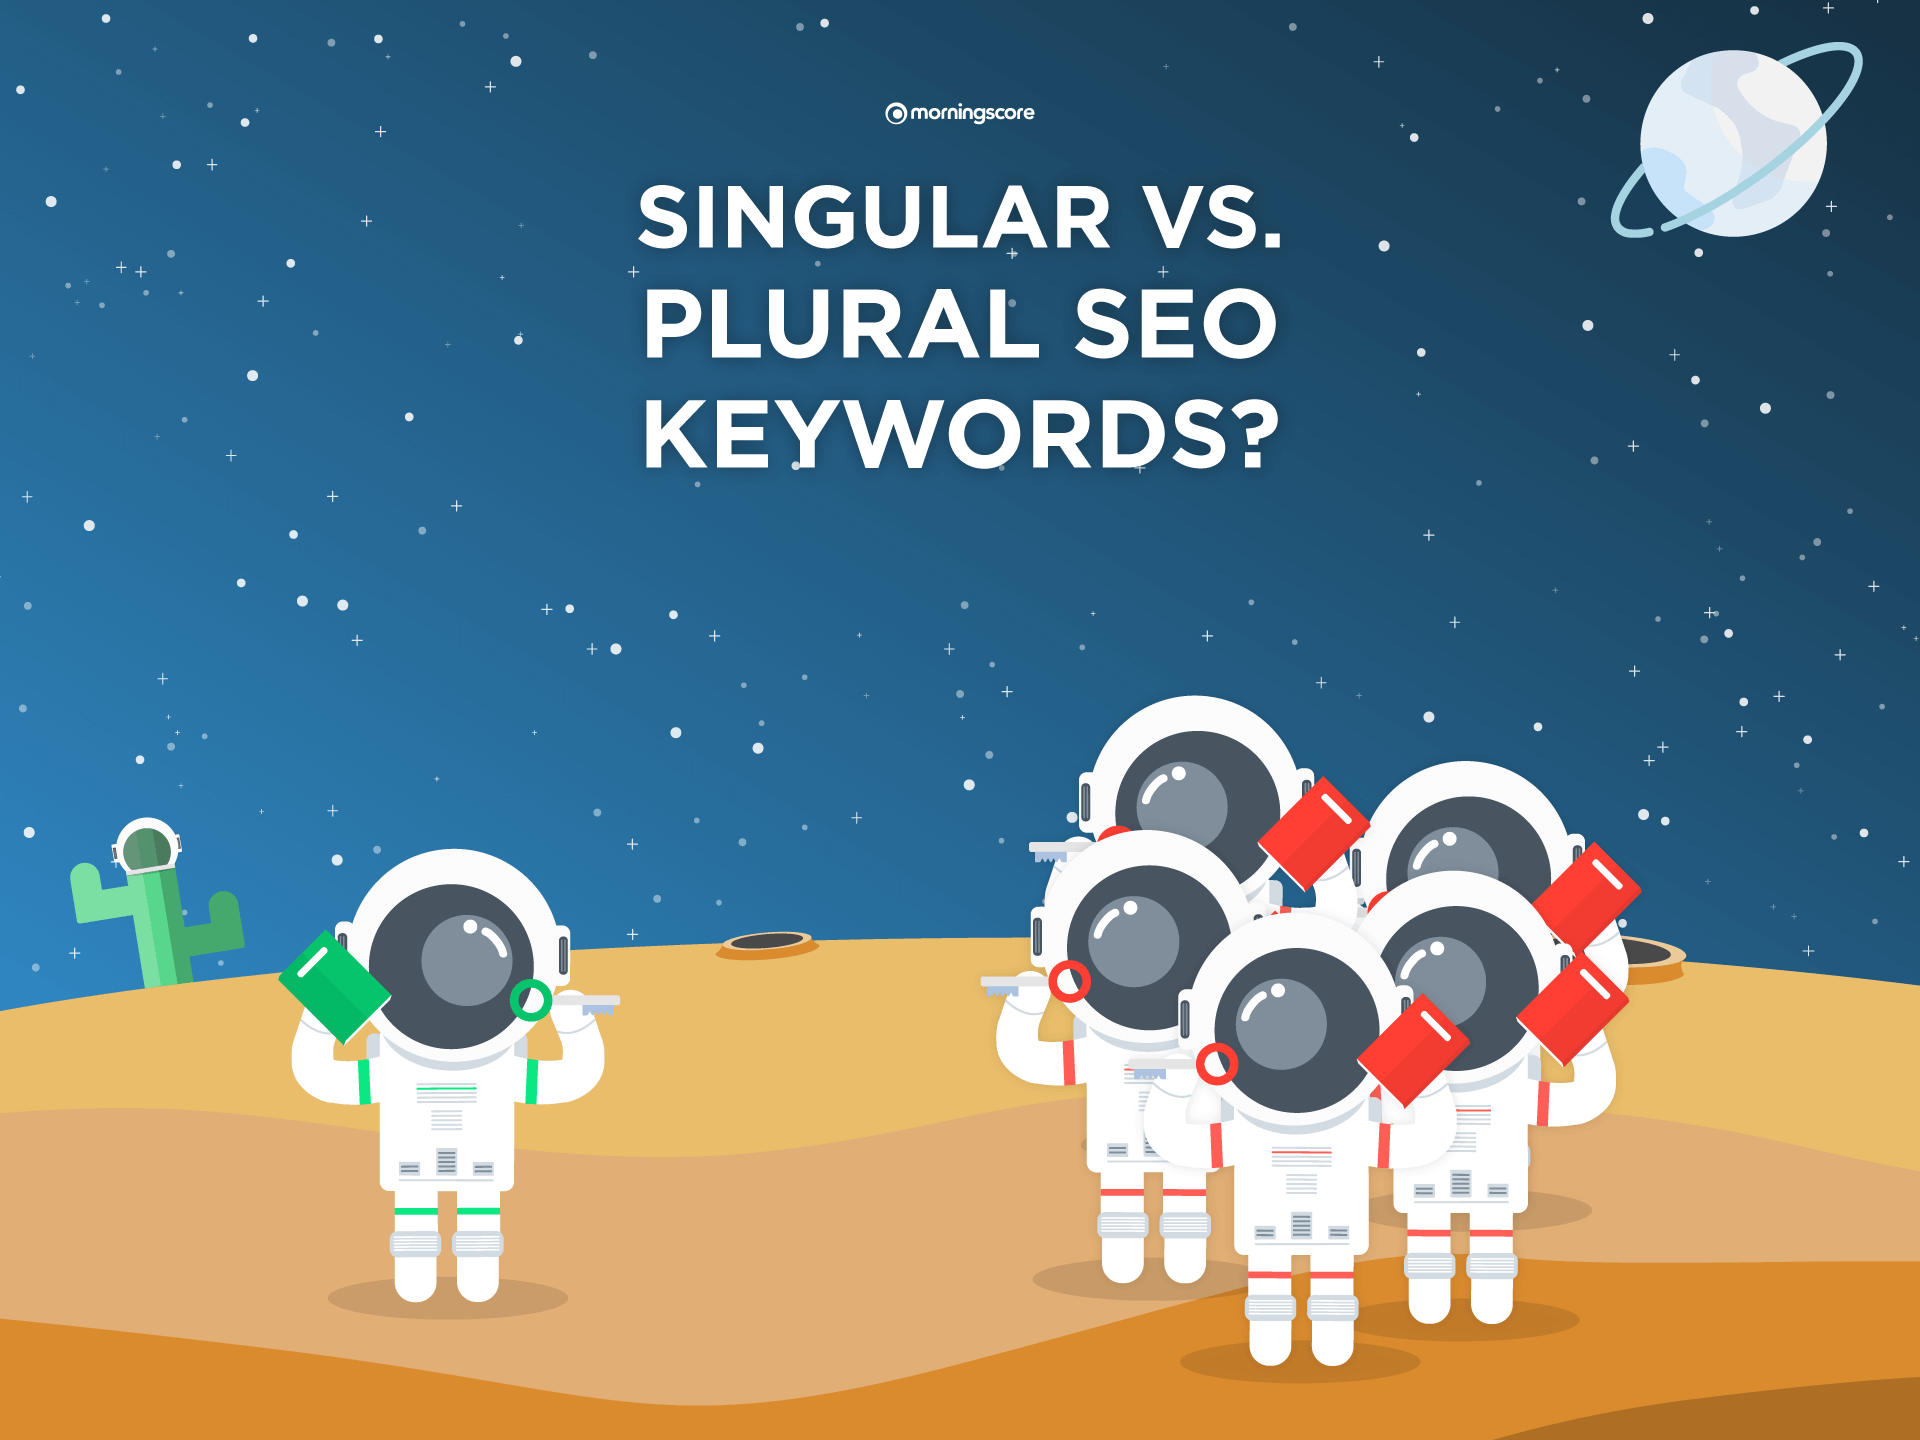 singular vs plural google seo keywords featured image